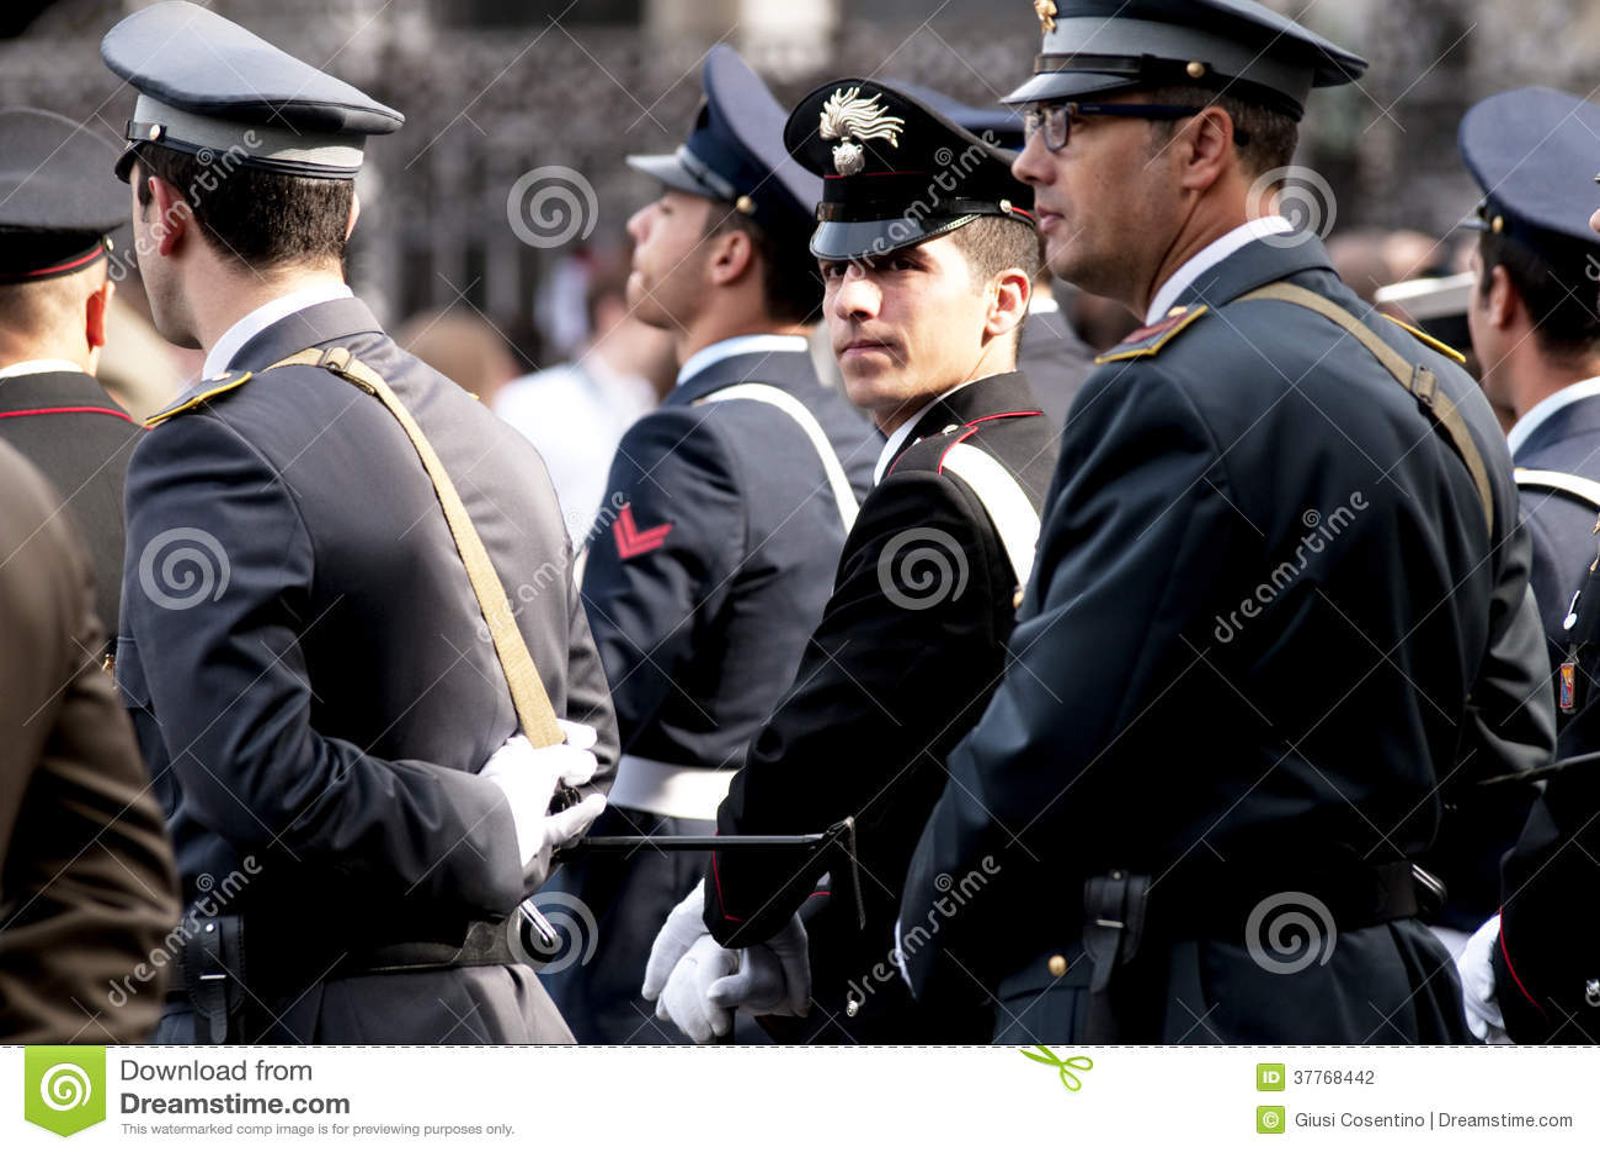 policemen in uniform editorial photography image 37768442